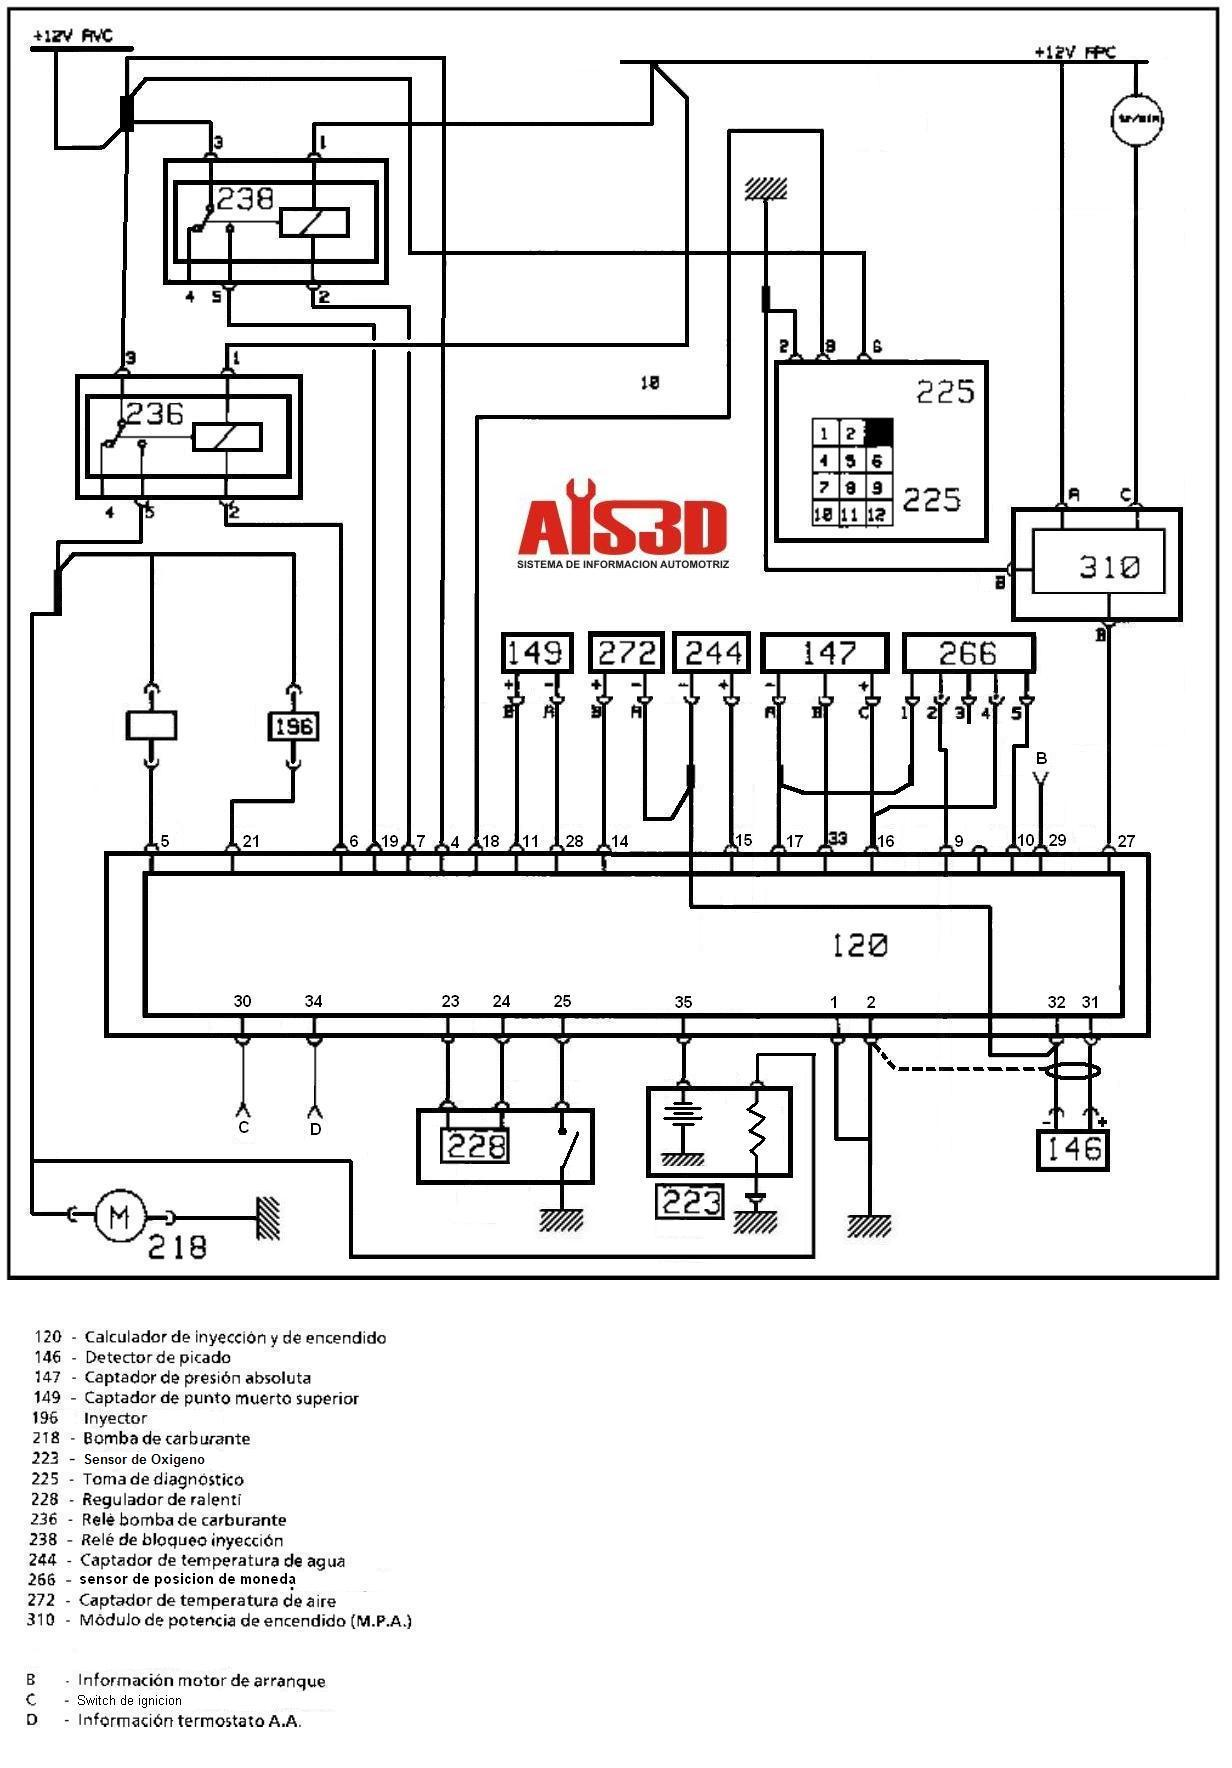 renault clio grande 2000 wiring diagram